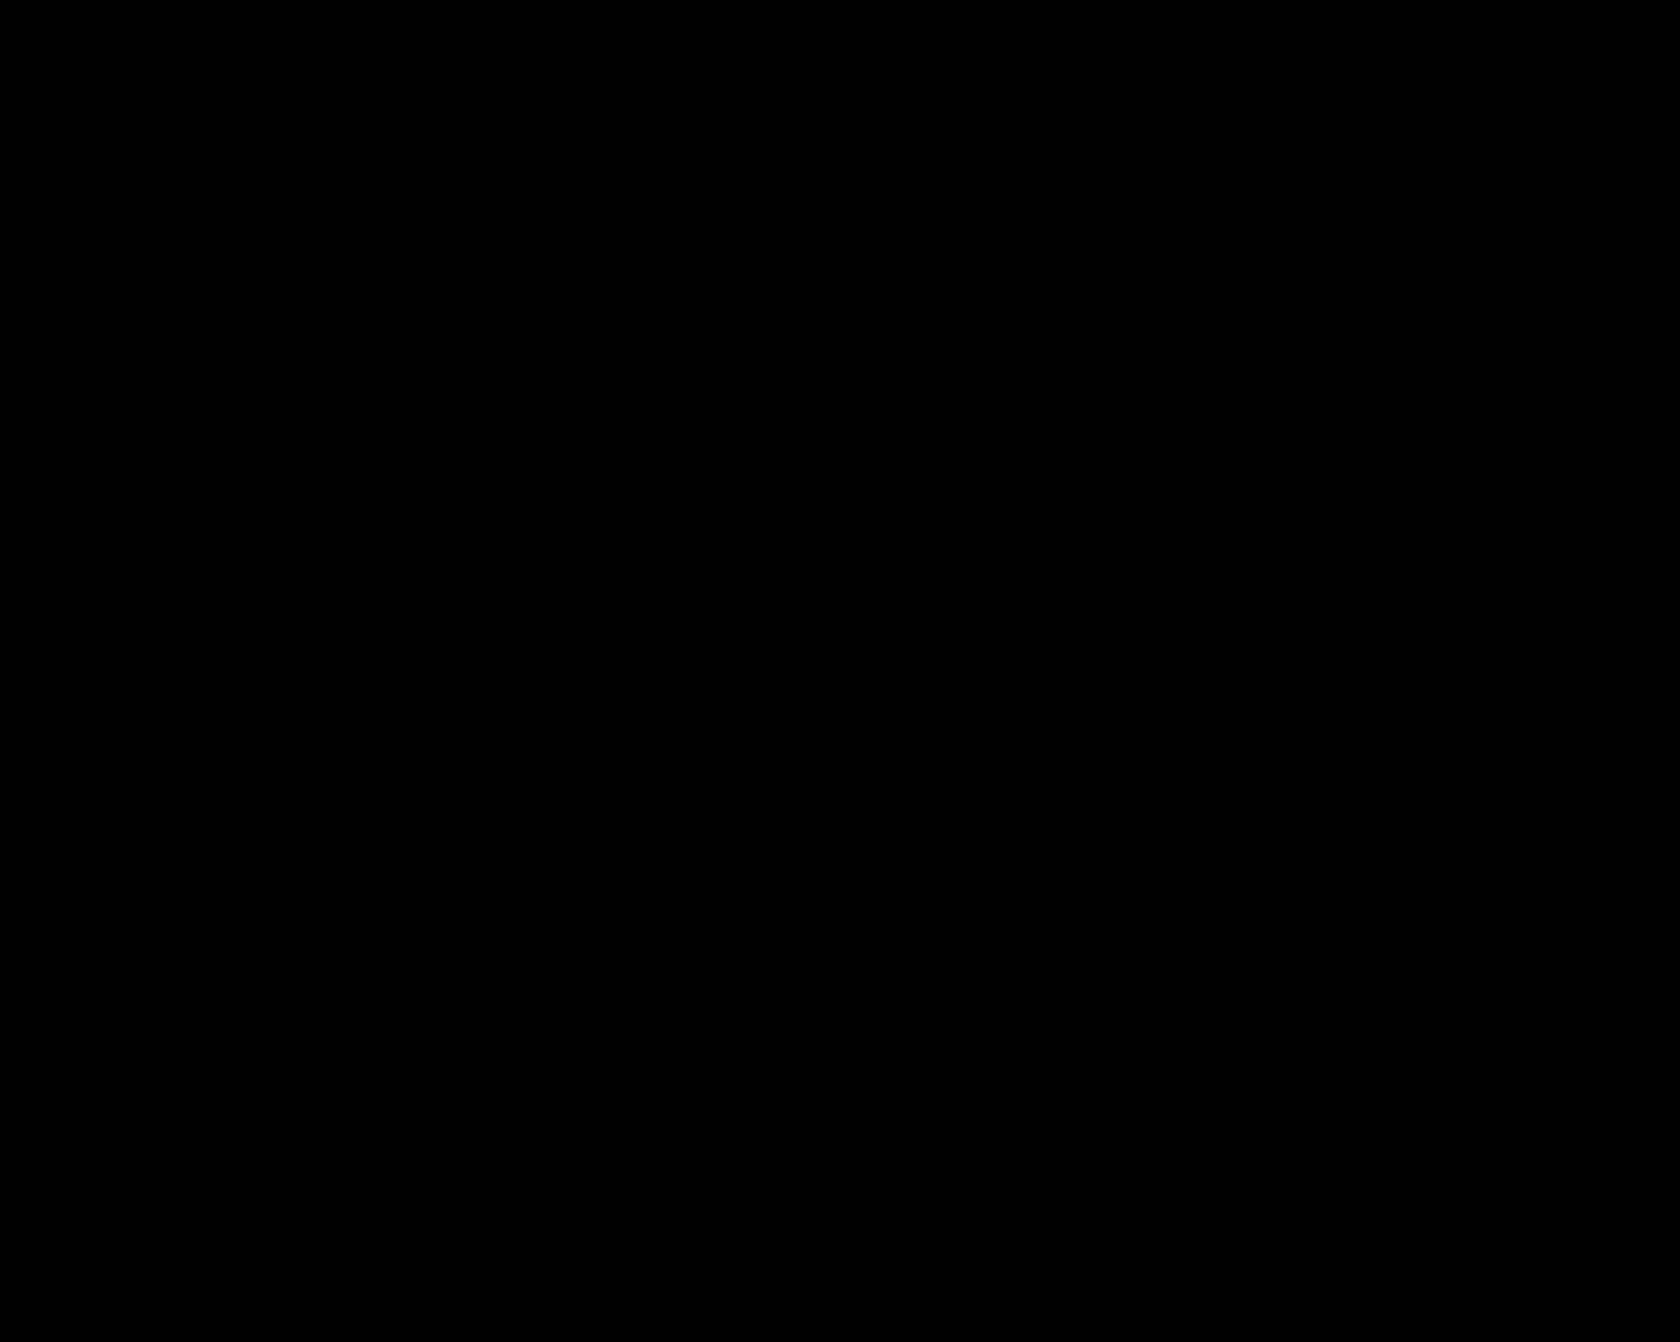 Tomeglovir